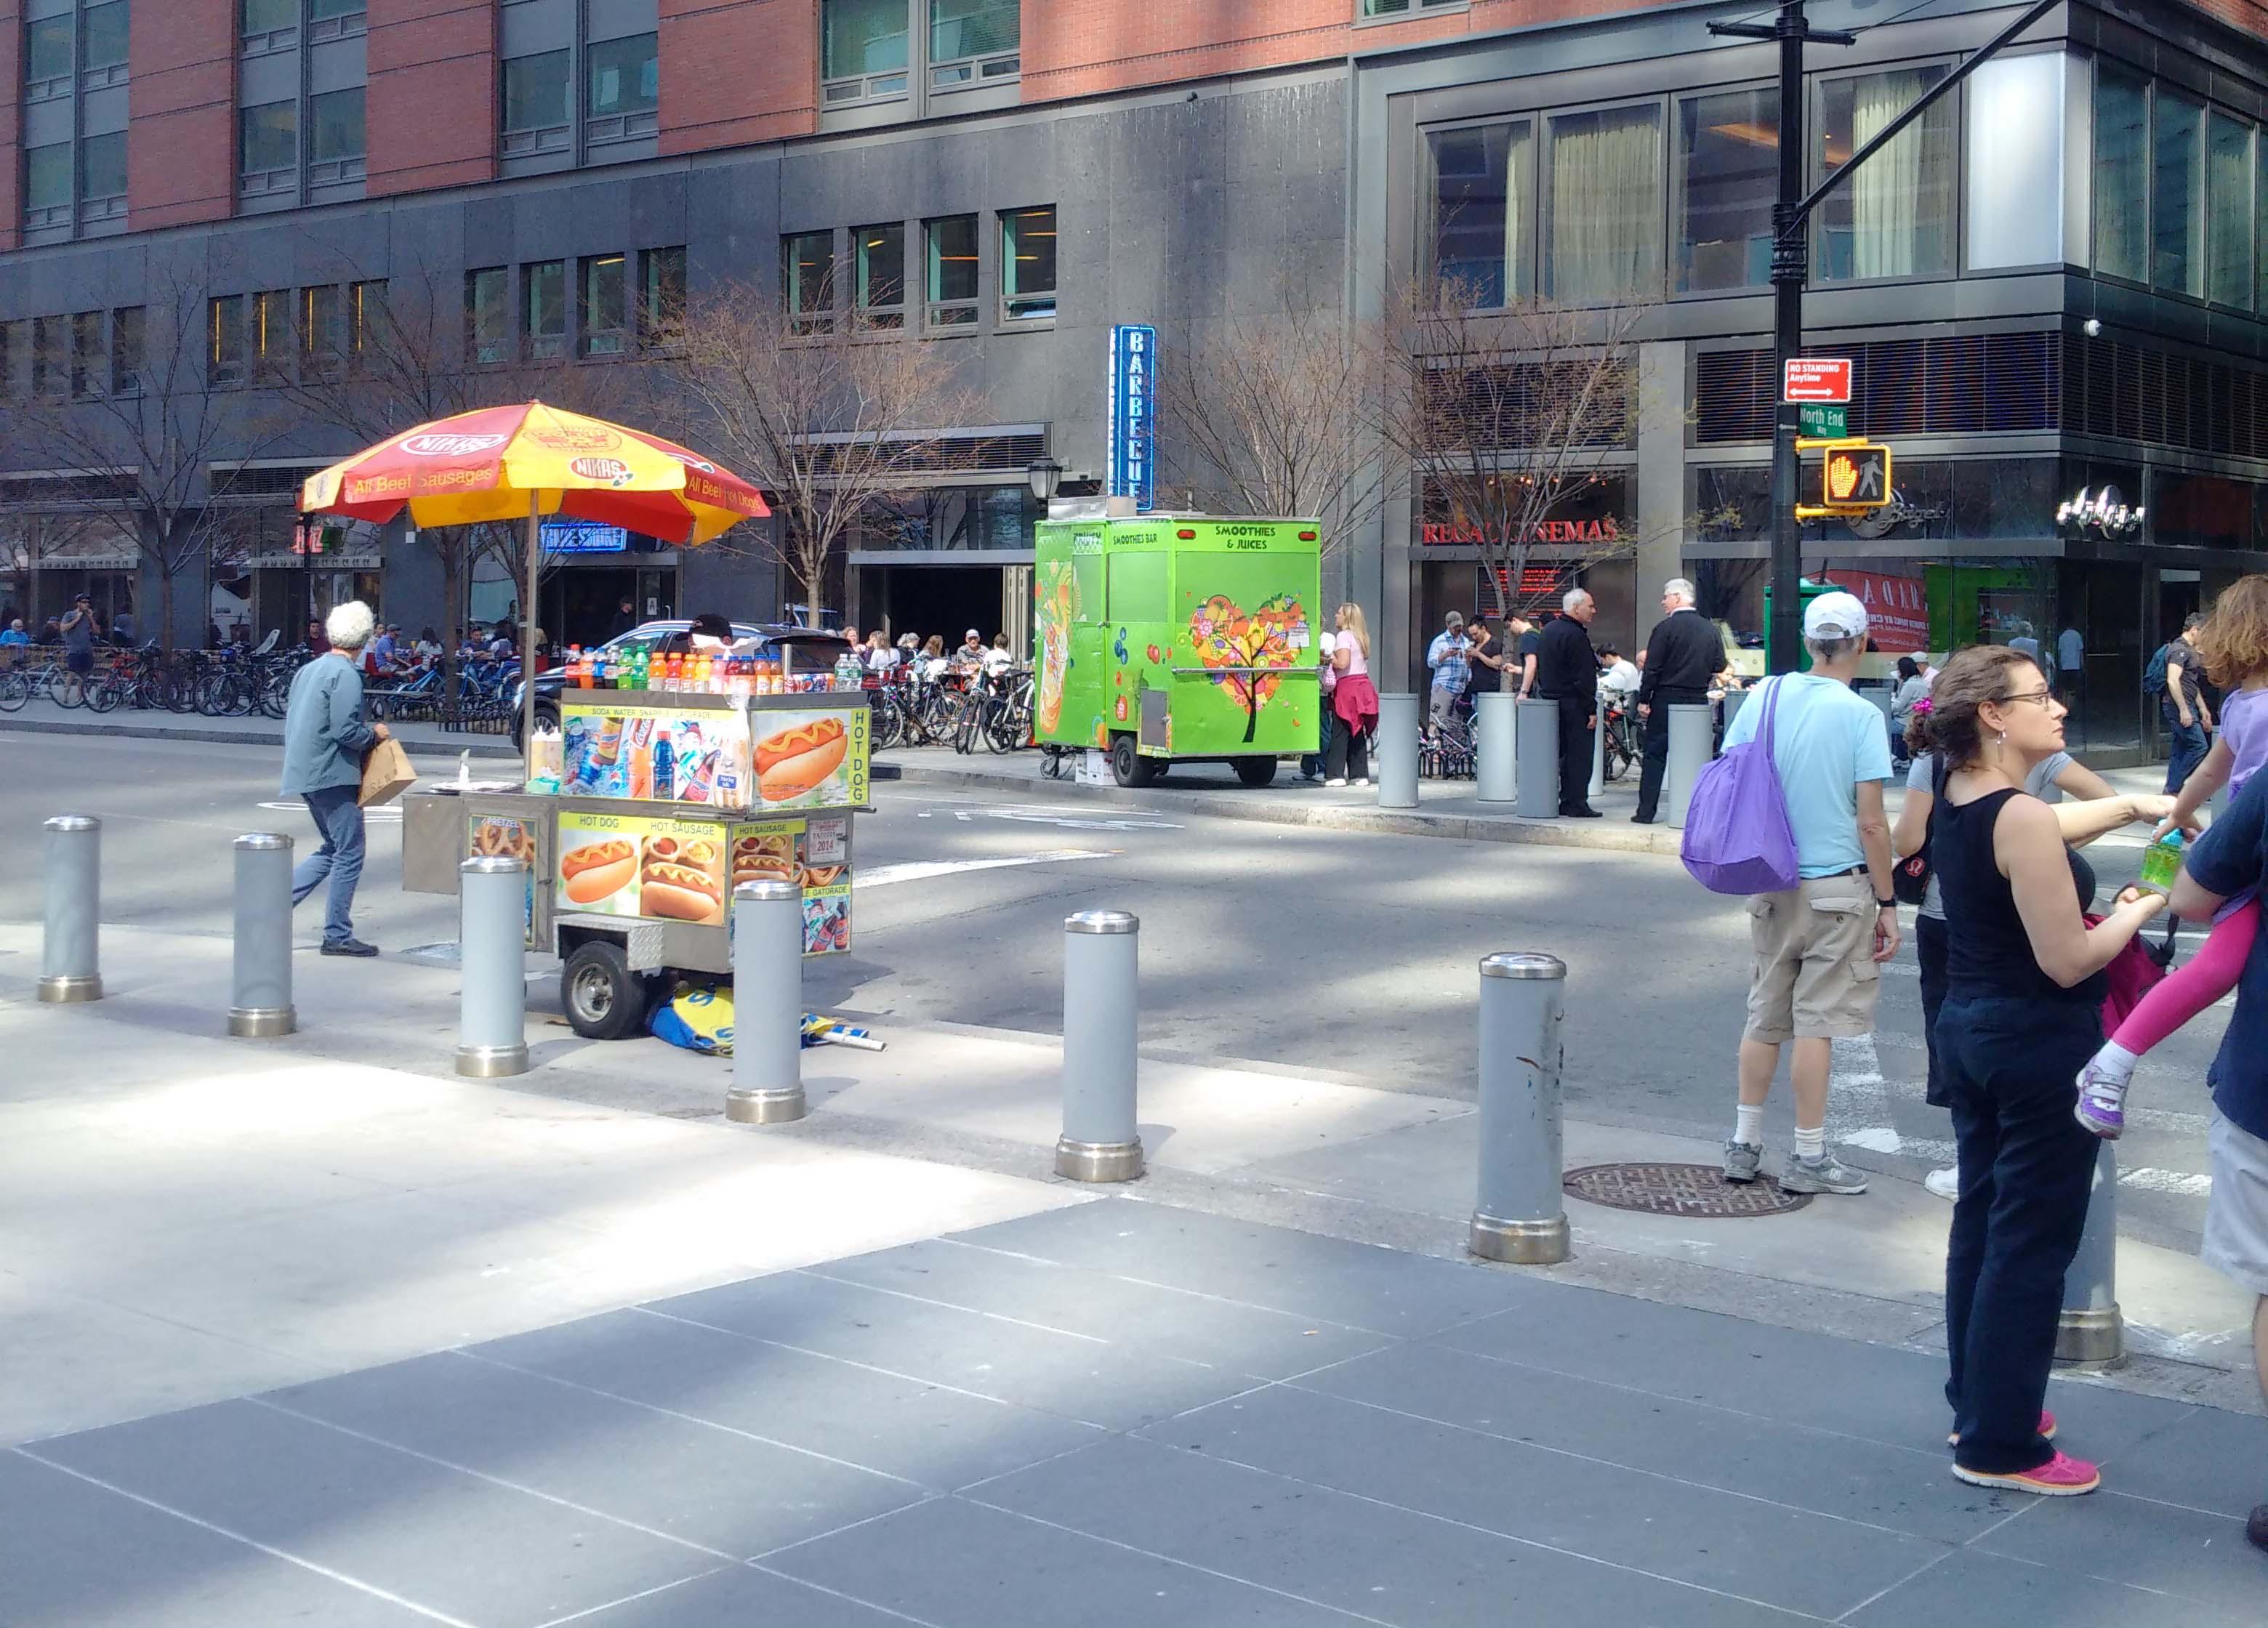 Fruit smoothie and hot dog on Vesey 4-18-2015